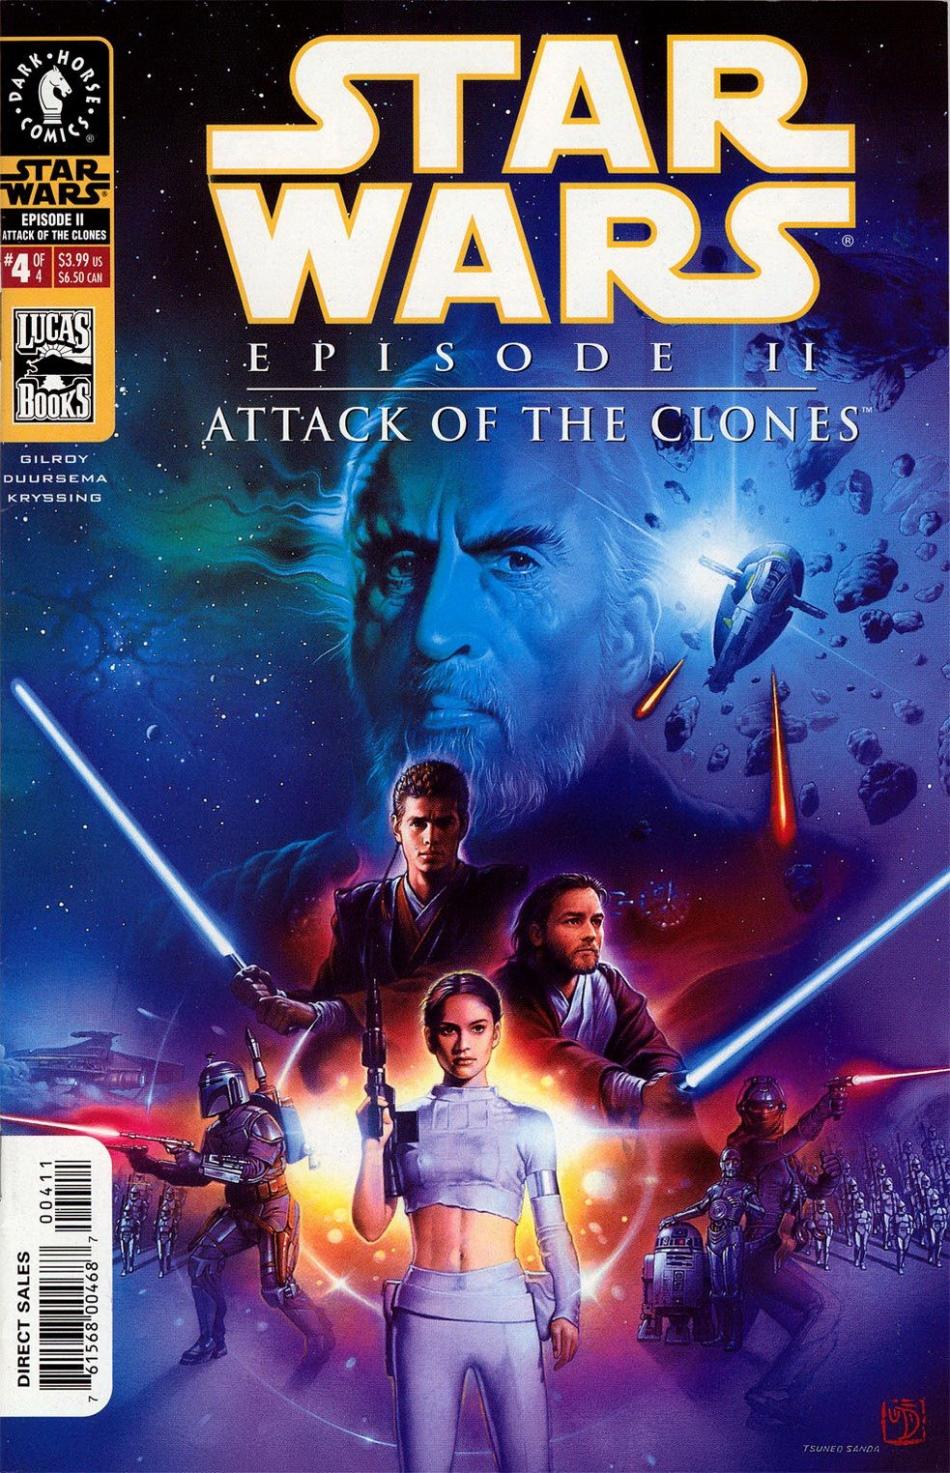 Episode II: Attack of the Clones #4 (08.05.2002)